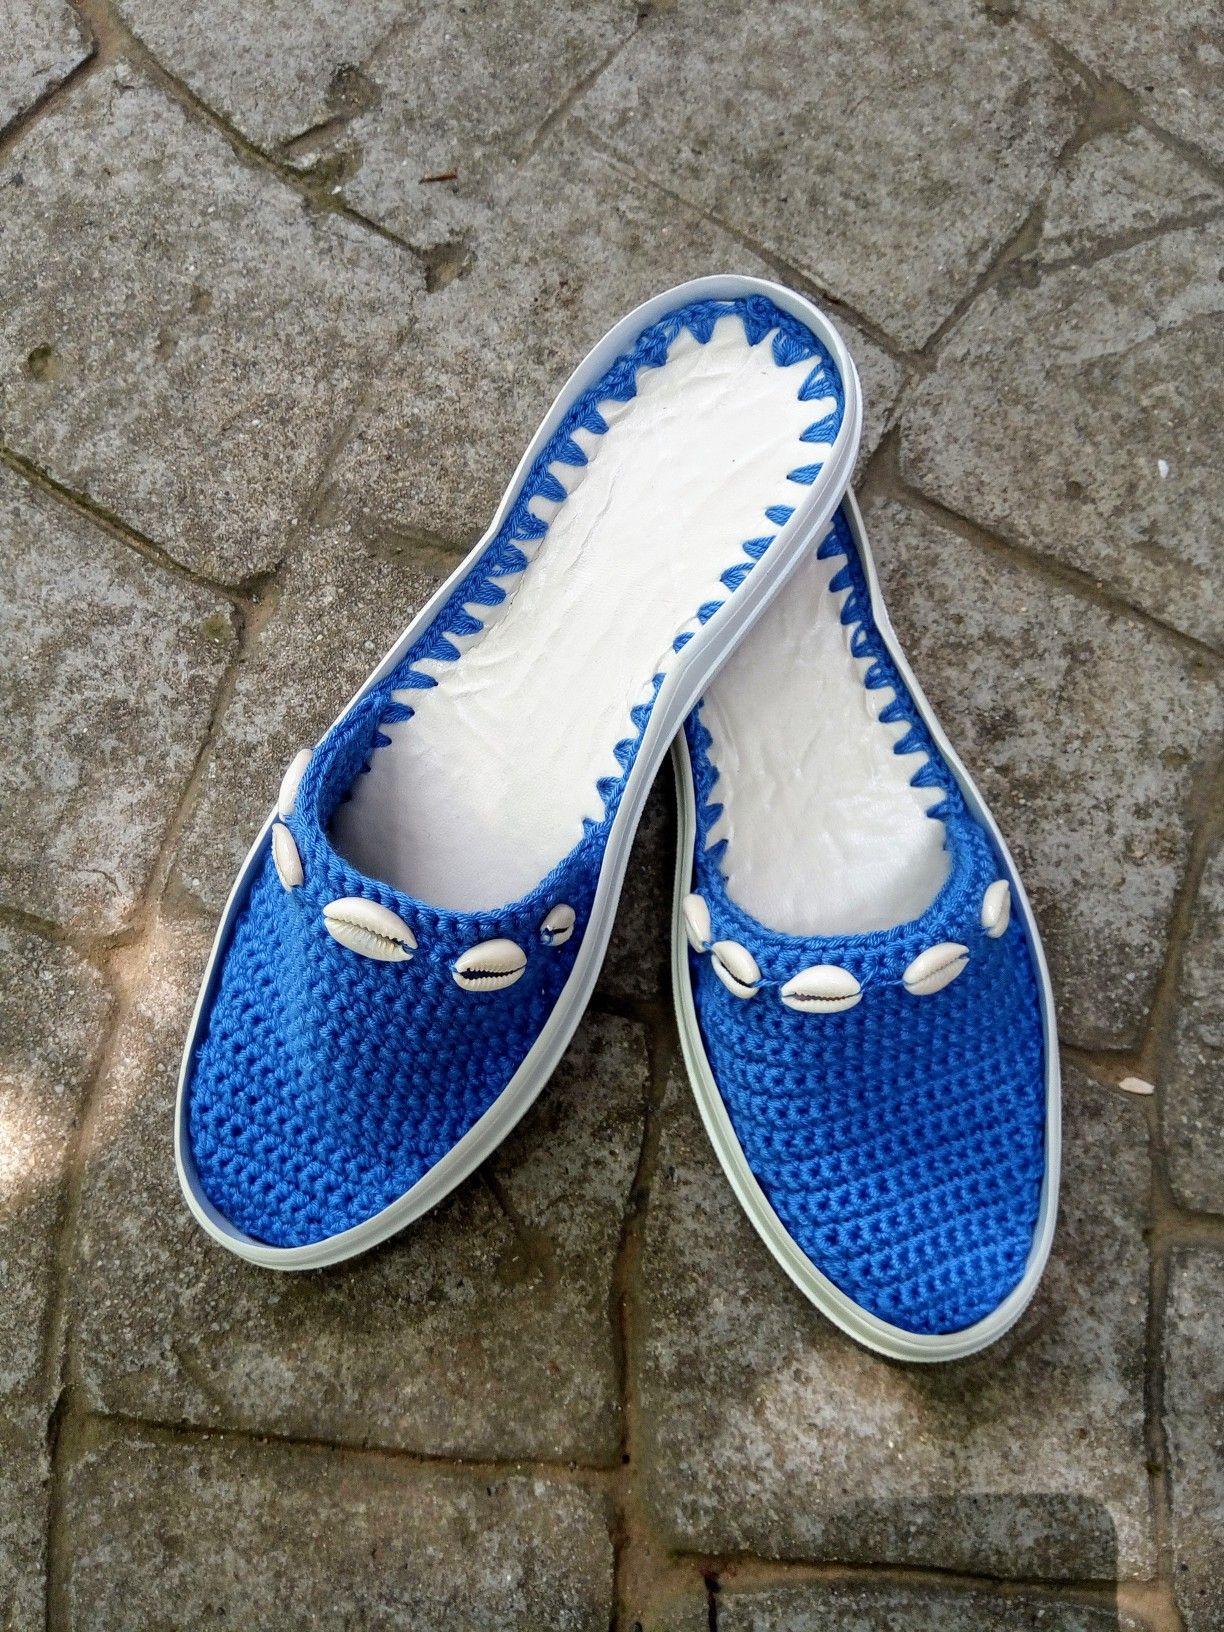 #bluecrochet #vintagestores #handmadegift #vintagestoreonline #ethnicbagshop #homedecorstore